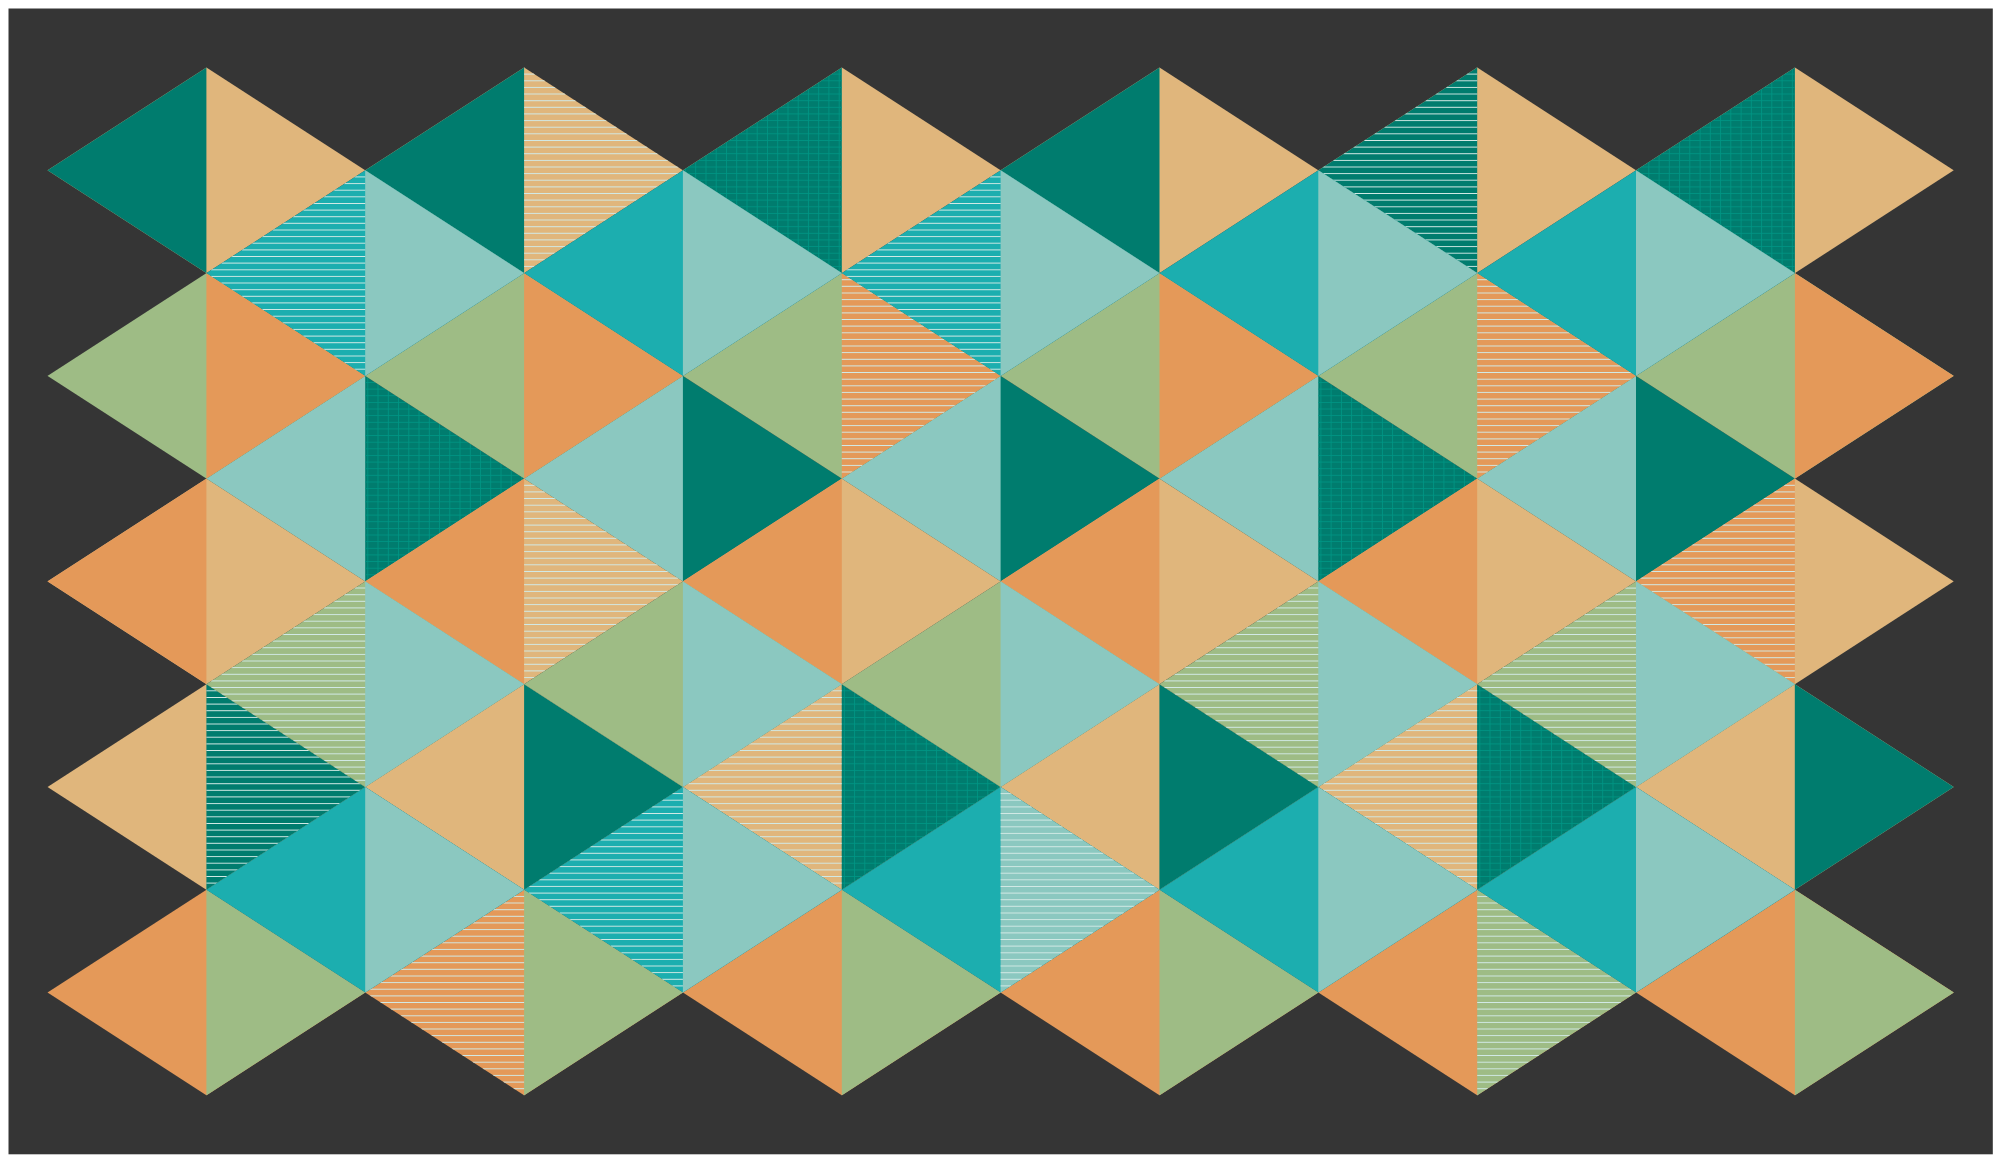 TenStickers. σχεδίαση μοντέρνα χαλιά μοτίβου losange. εκπληκτικό ντιζάιν μοτίβο χαζάν μοτίβο βινυλίου σε εξαιρετικό σχήμα για την είσοδο και άλλους εσωτερικούς χώρους σε ένα σπίτι. ένα καταπληκτικό χαλί βινυλίου.